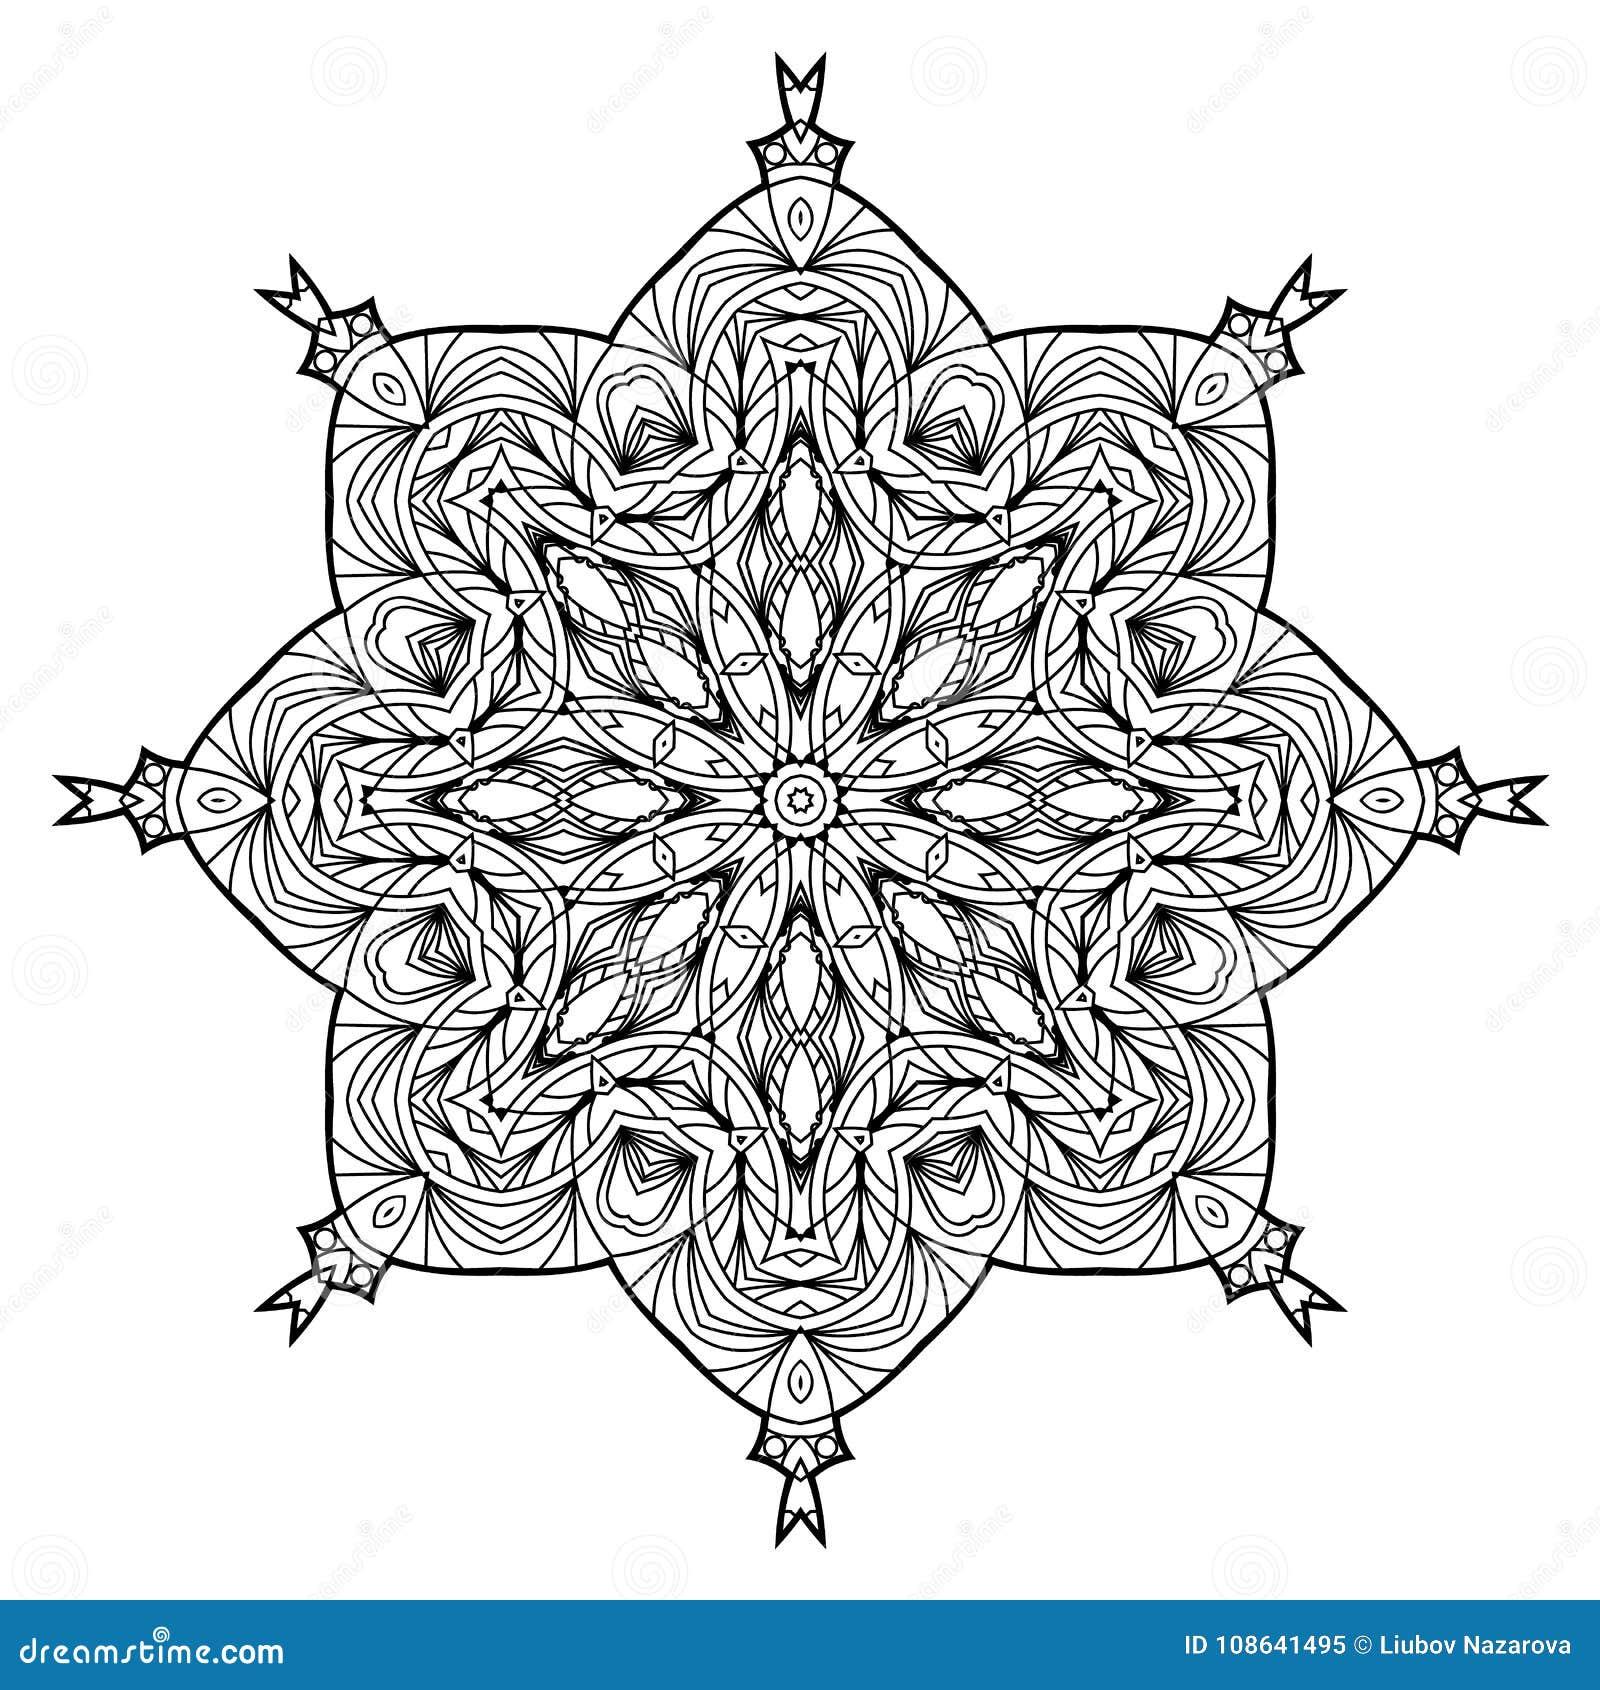 Flower Mandala Vintage Decorative Elements Oriental Pattern Illustration Coloring Book Page Islam Arabic Indian Moroccan Spain Turkish Mystic